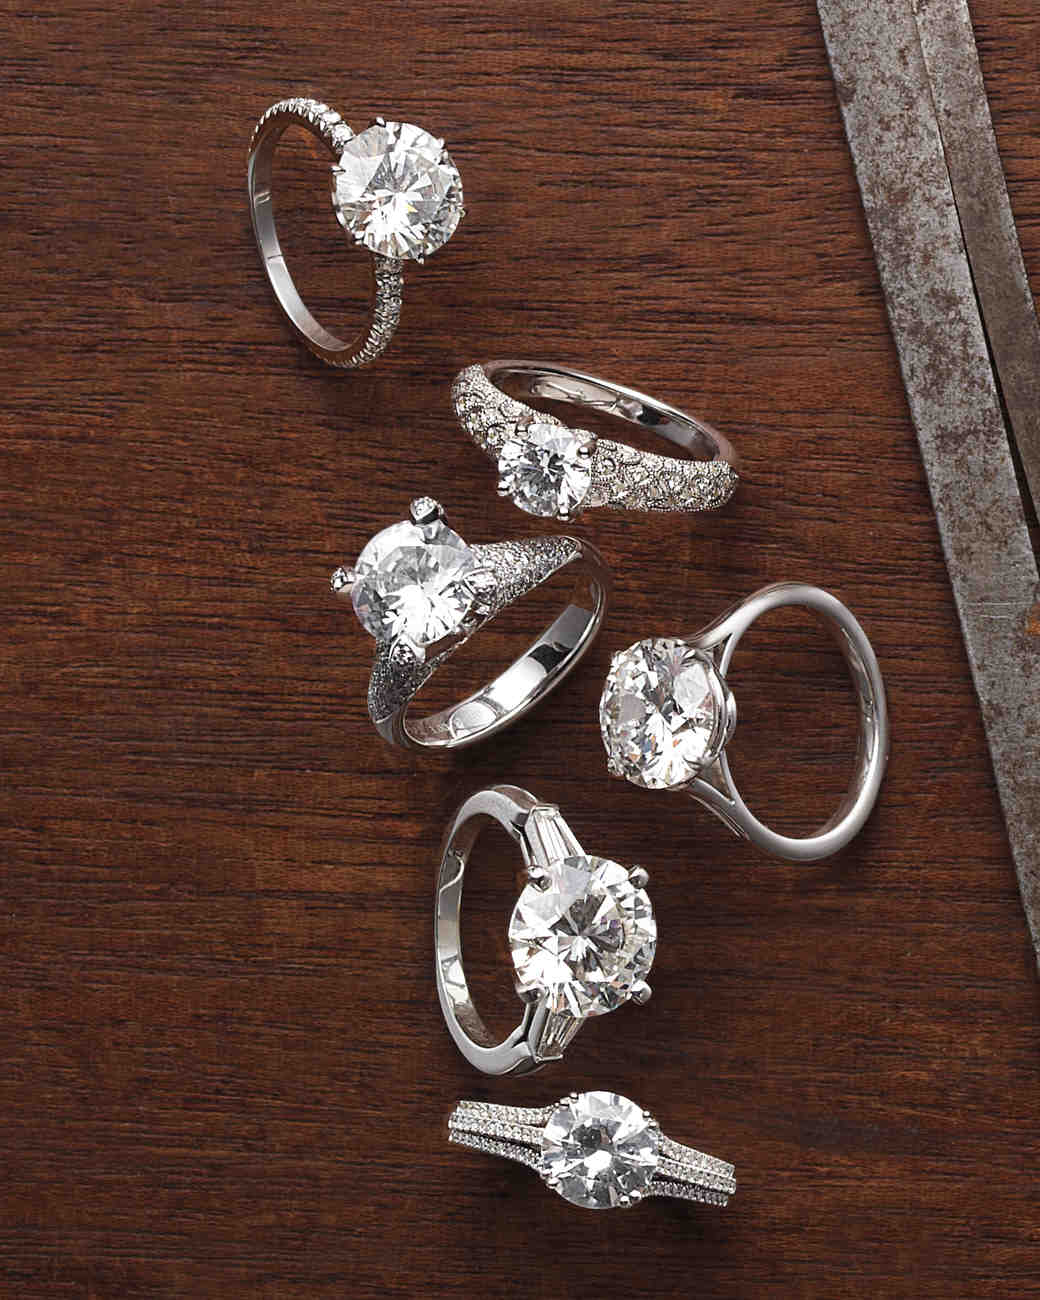 carat-002-hl-rings-comp-1-mwd110317.jpg